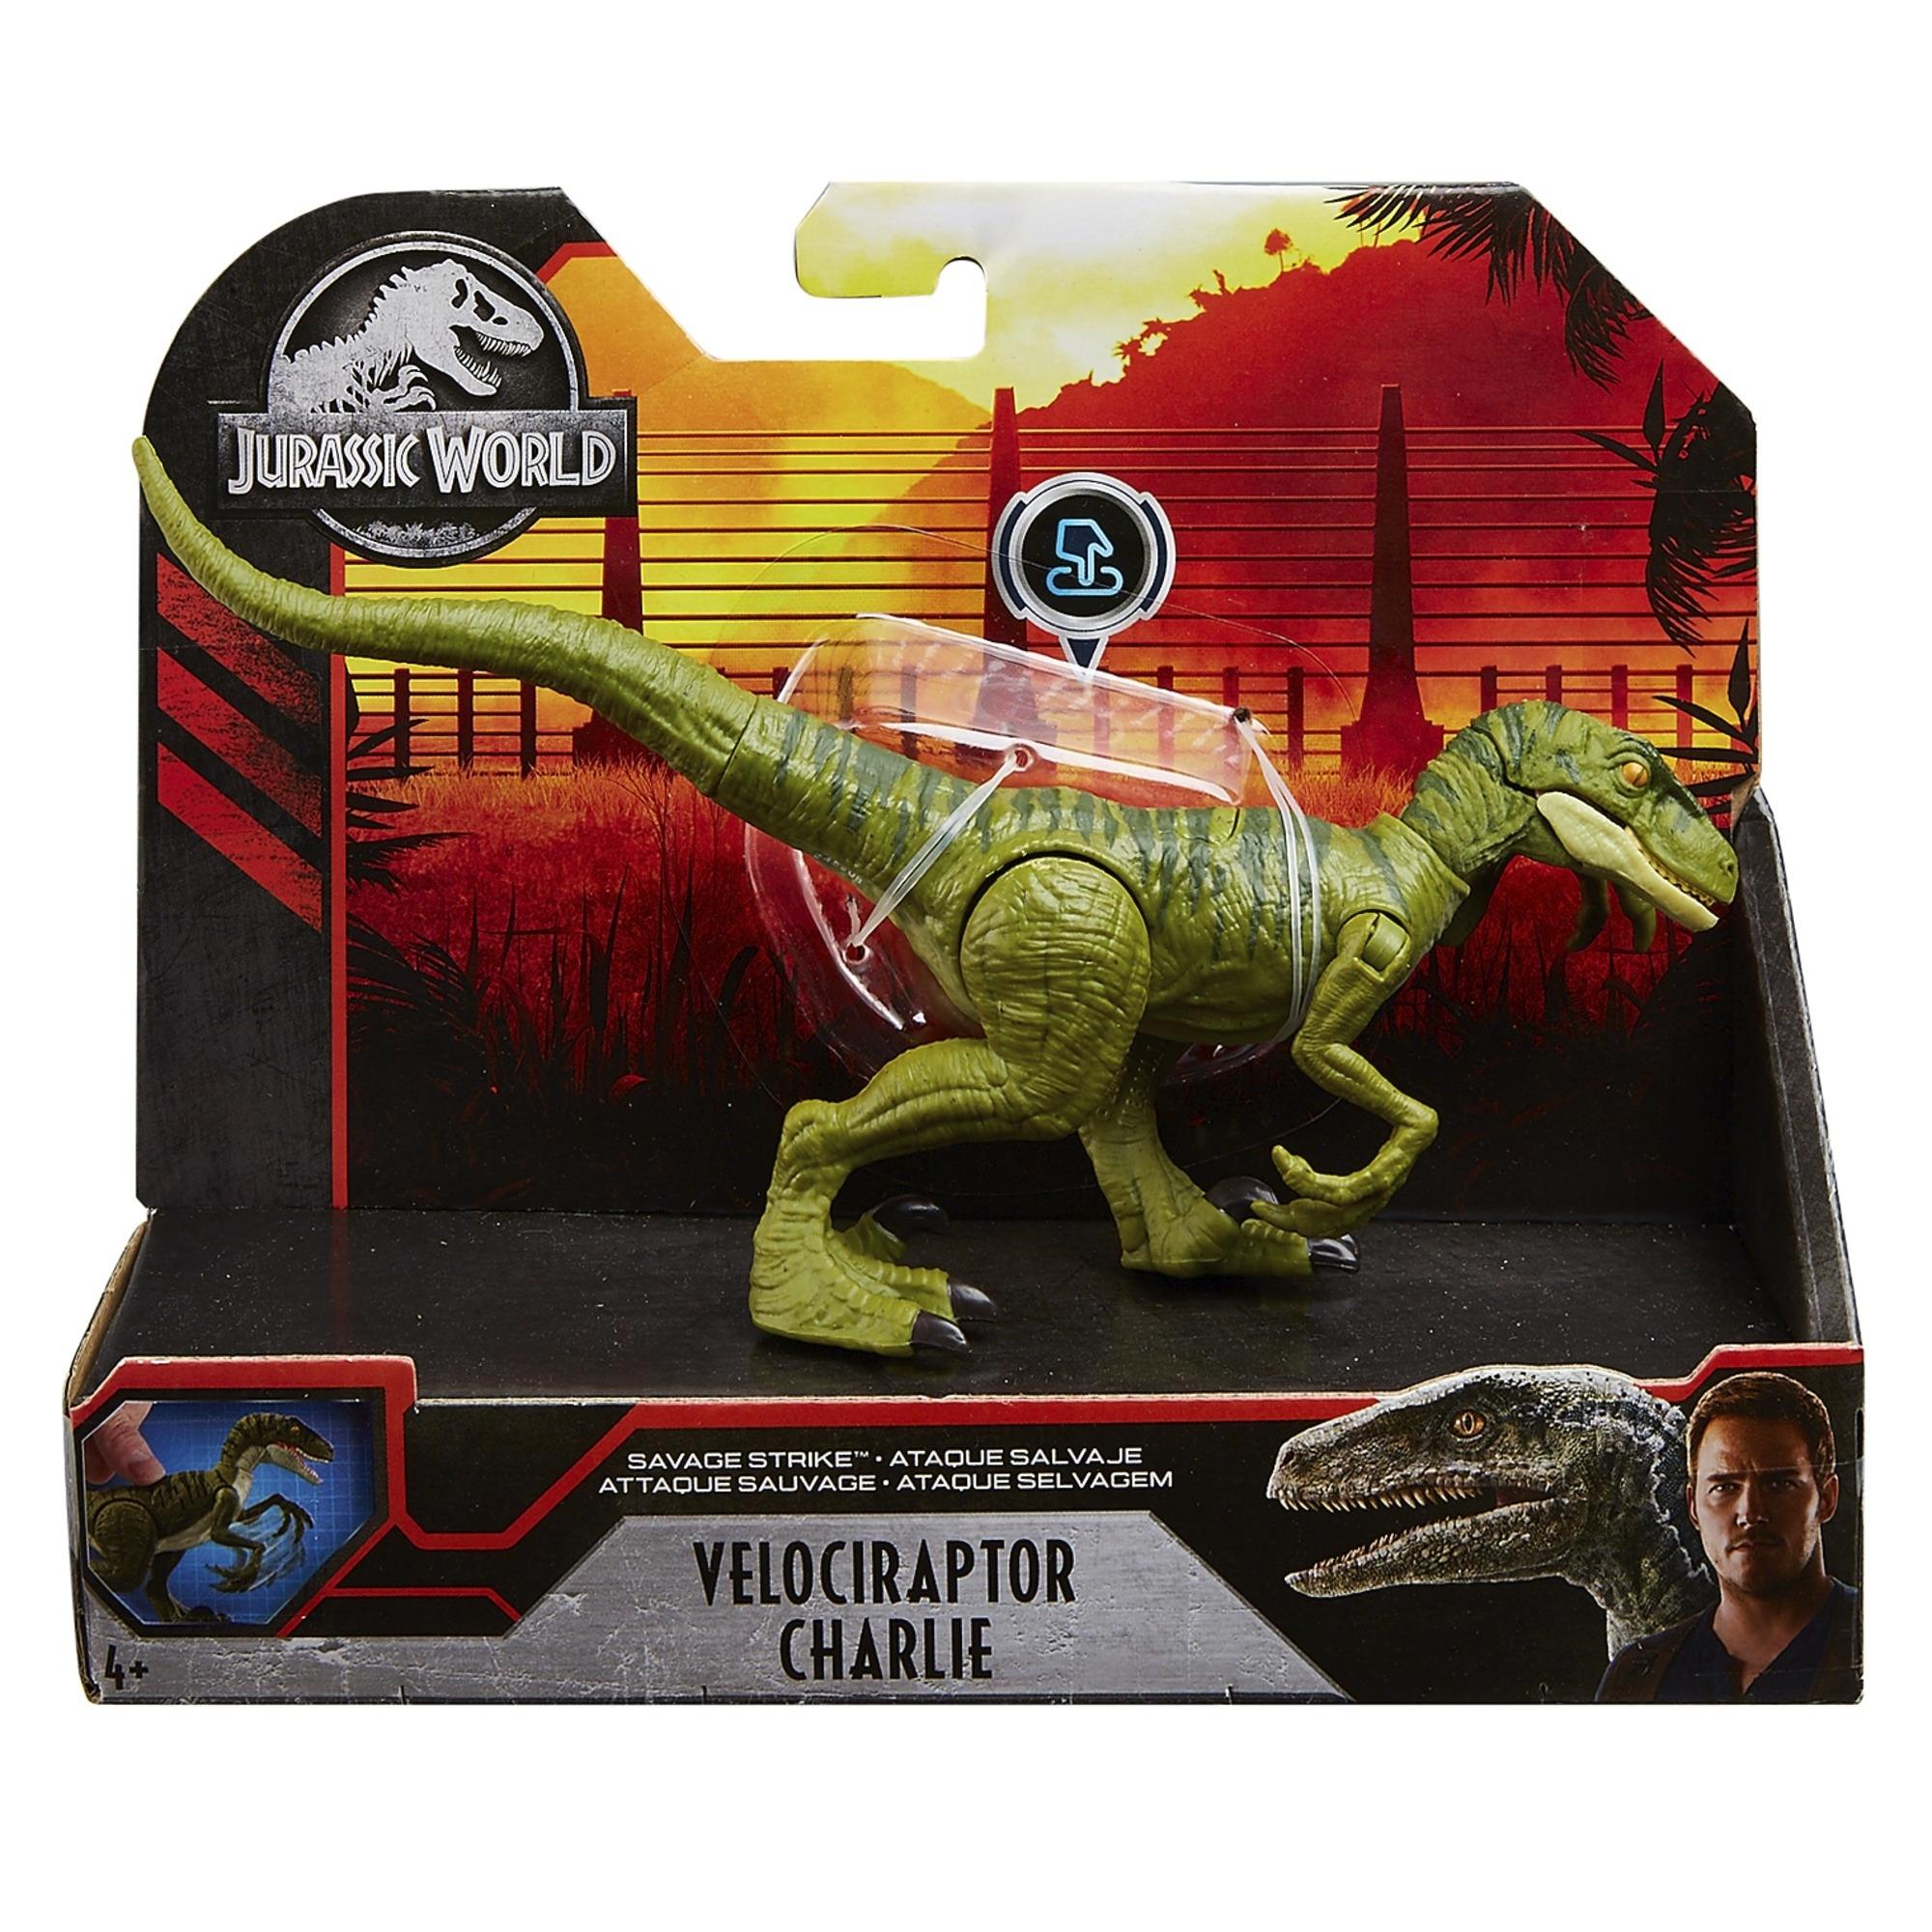 Jurassic World: Ryk bojowy - Welociraptor Charlie  (GCR54/GJN92)